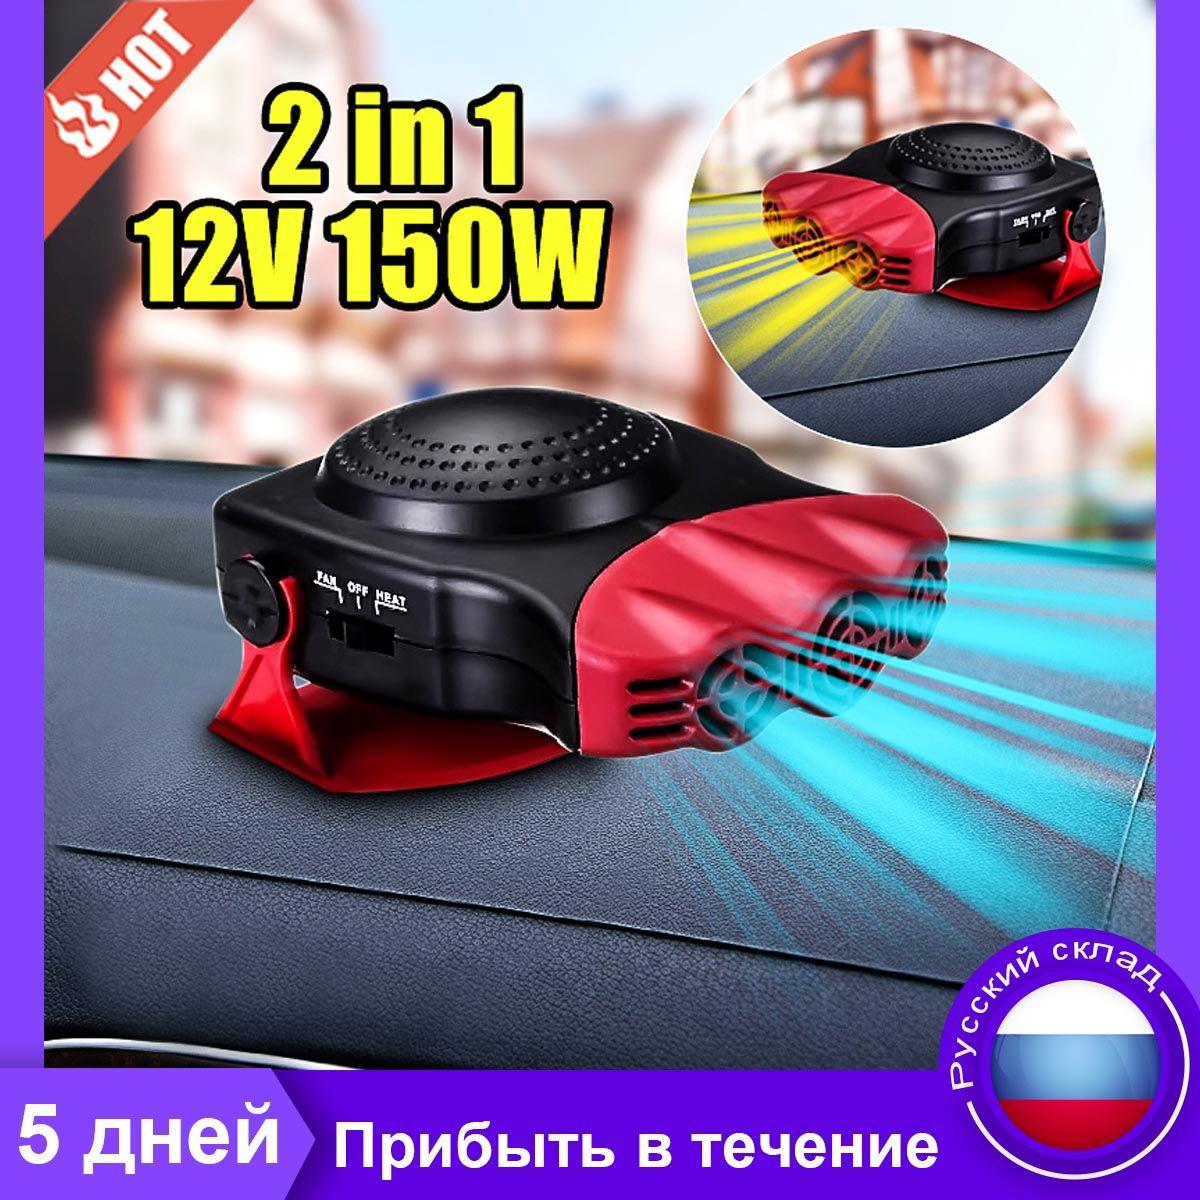 12 V 150 W Protable Auto Auto Heizung Heizung Lüfter Windschutz Fenster Demister DEFROSTER Fahren Defroster Demister